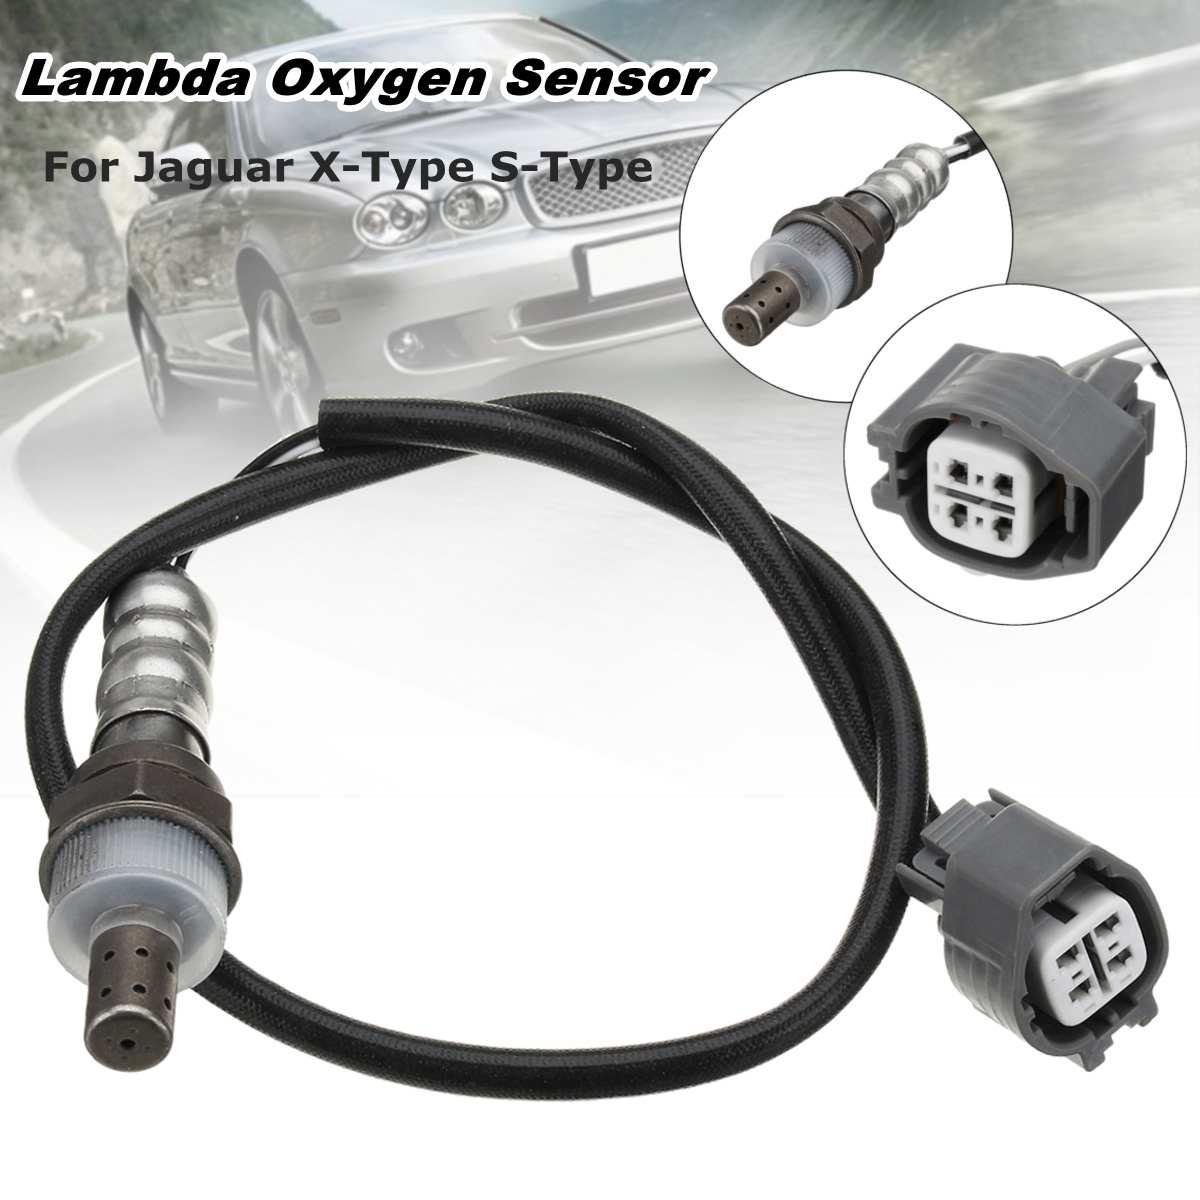 Lambda Oxygen Sensor For Jaguar X-Type S-Type 2.0/ 2.5/3.0 C2C25956 C2C7360